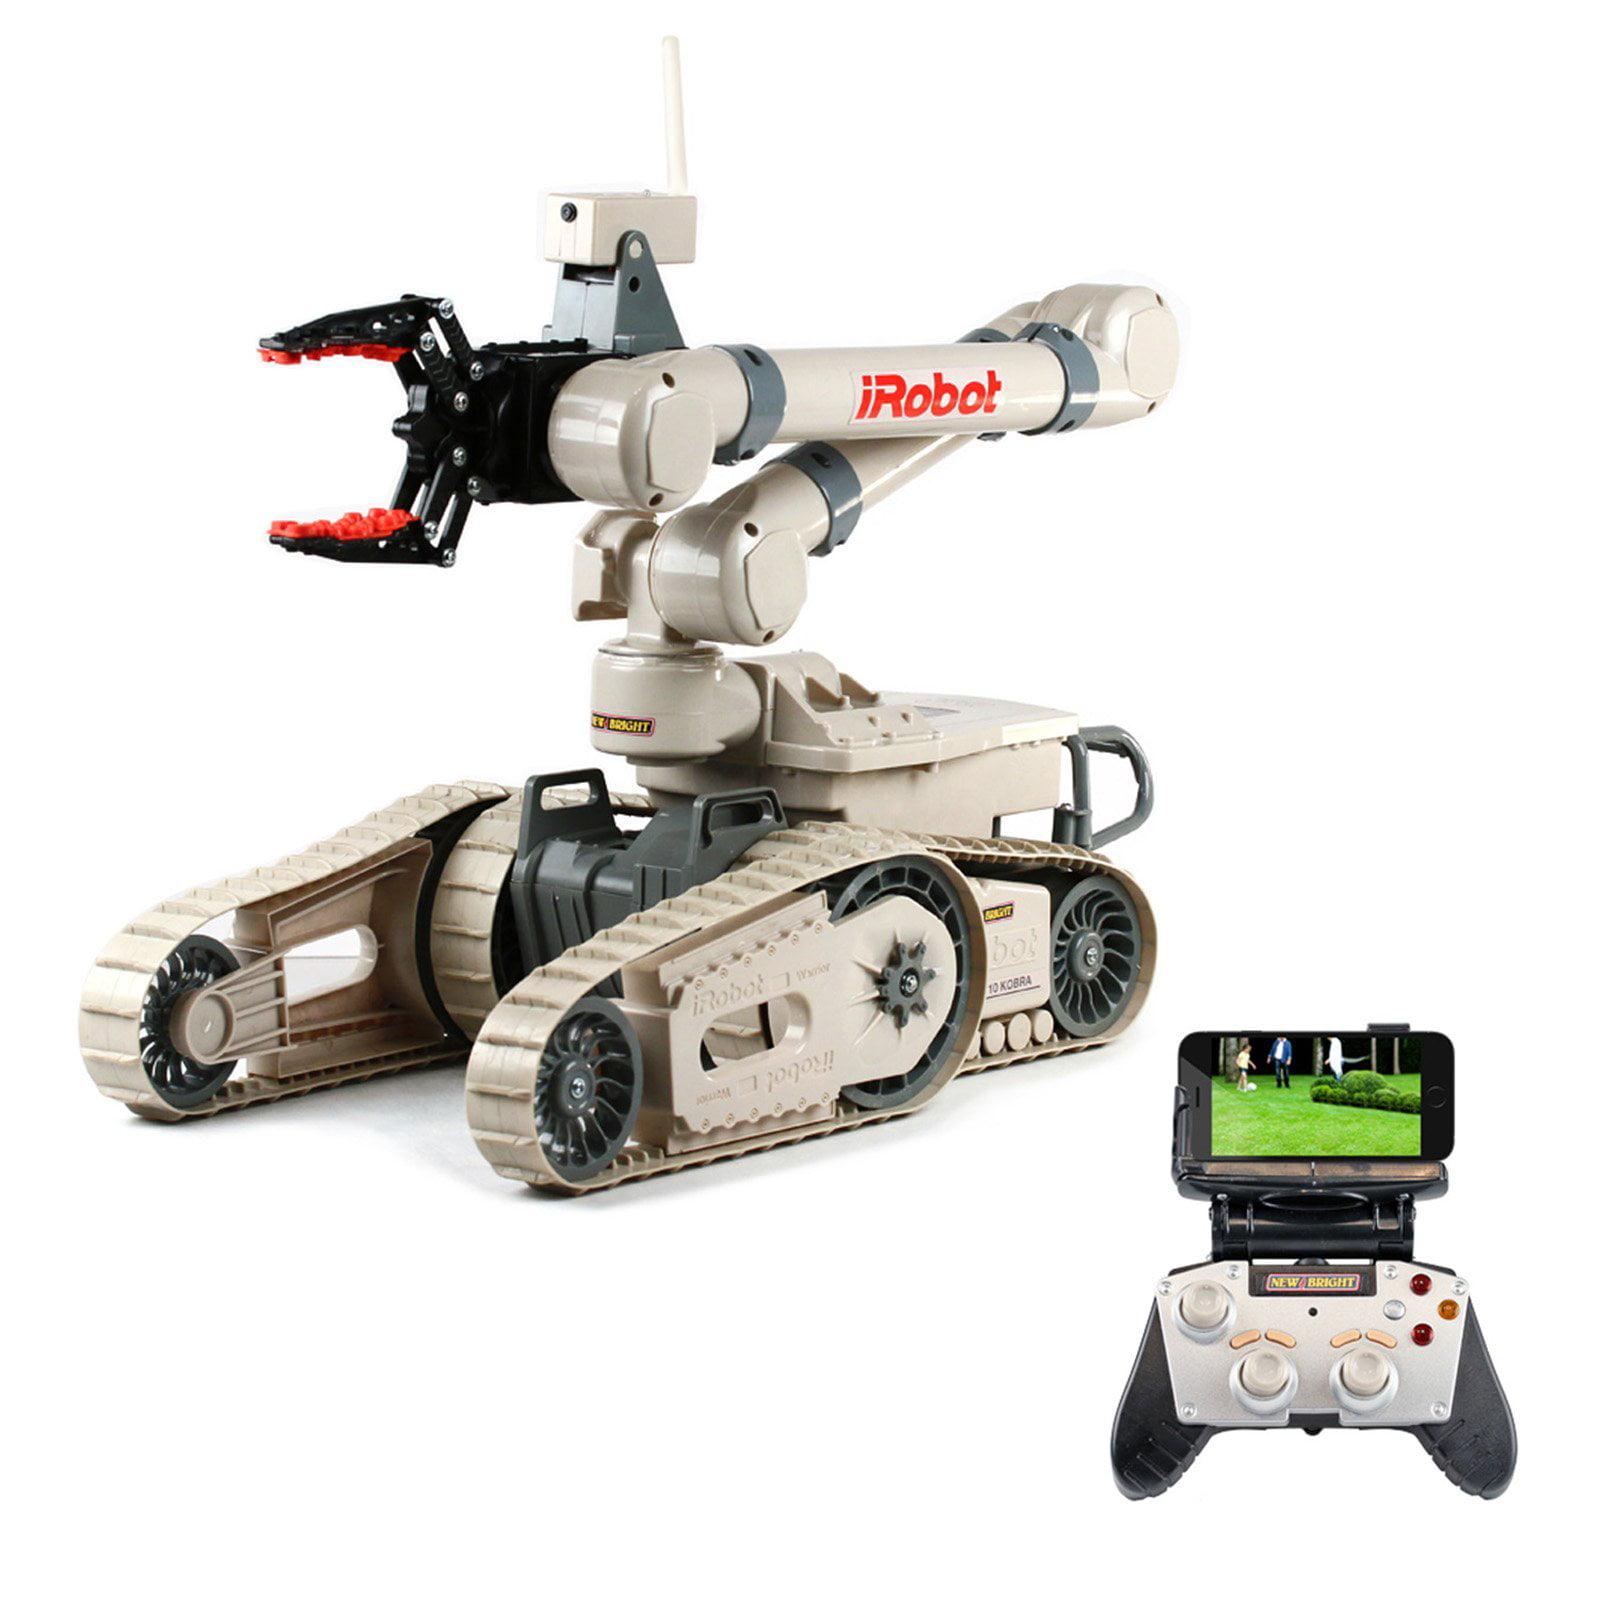 New Bright 1:3 Radio Control Multi-Function 12.8V iRobot 710 Kobra